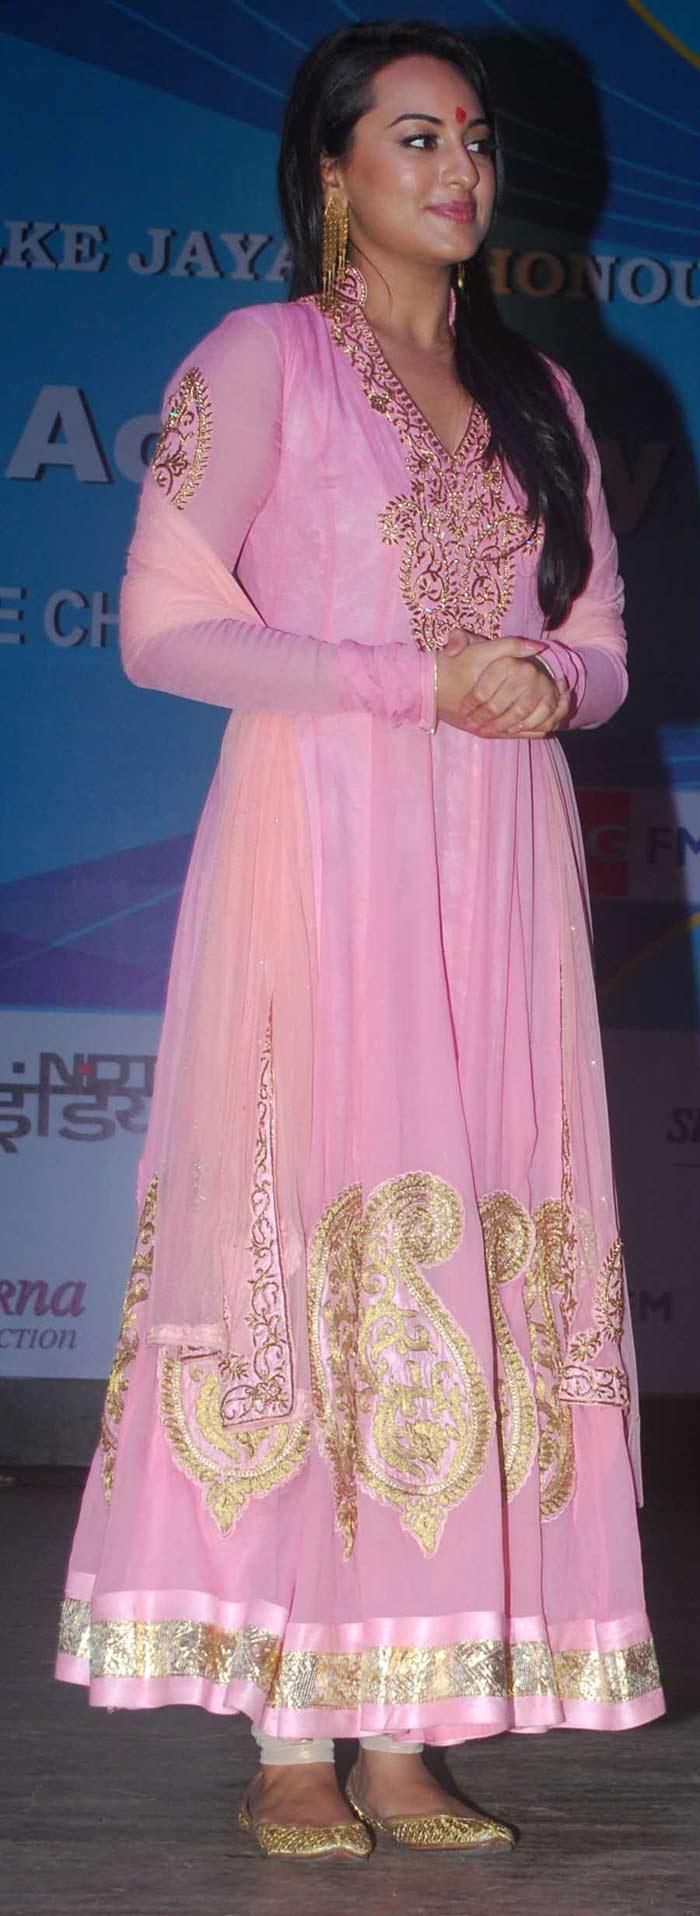 sonakshi in pink anarkali dress